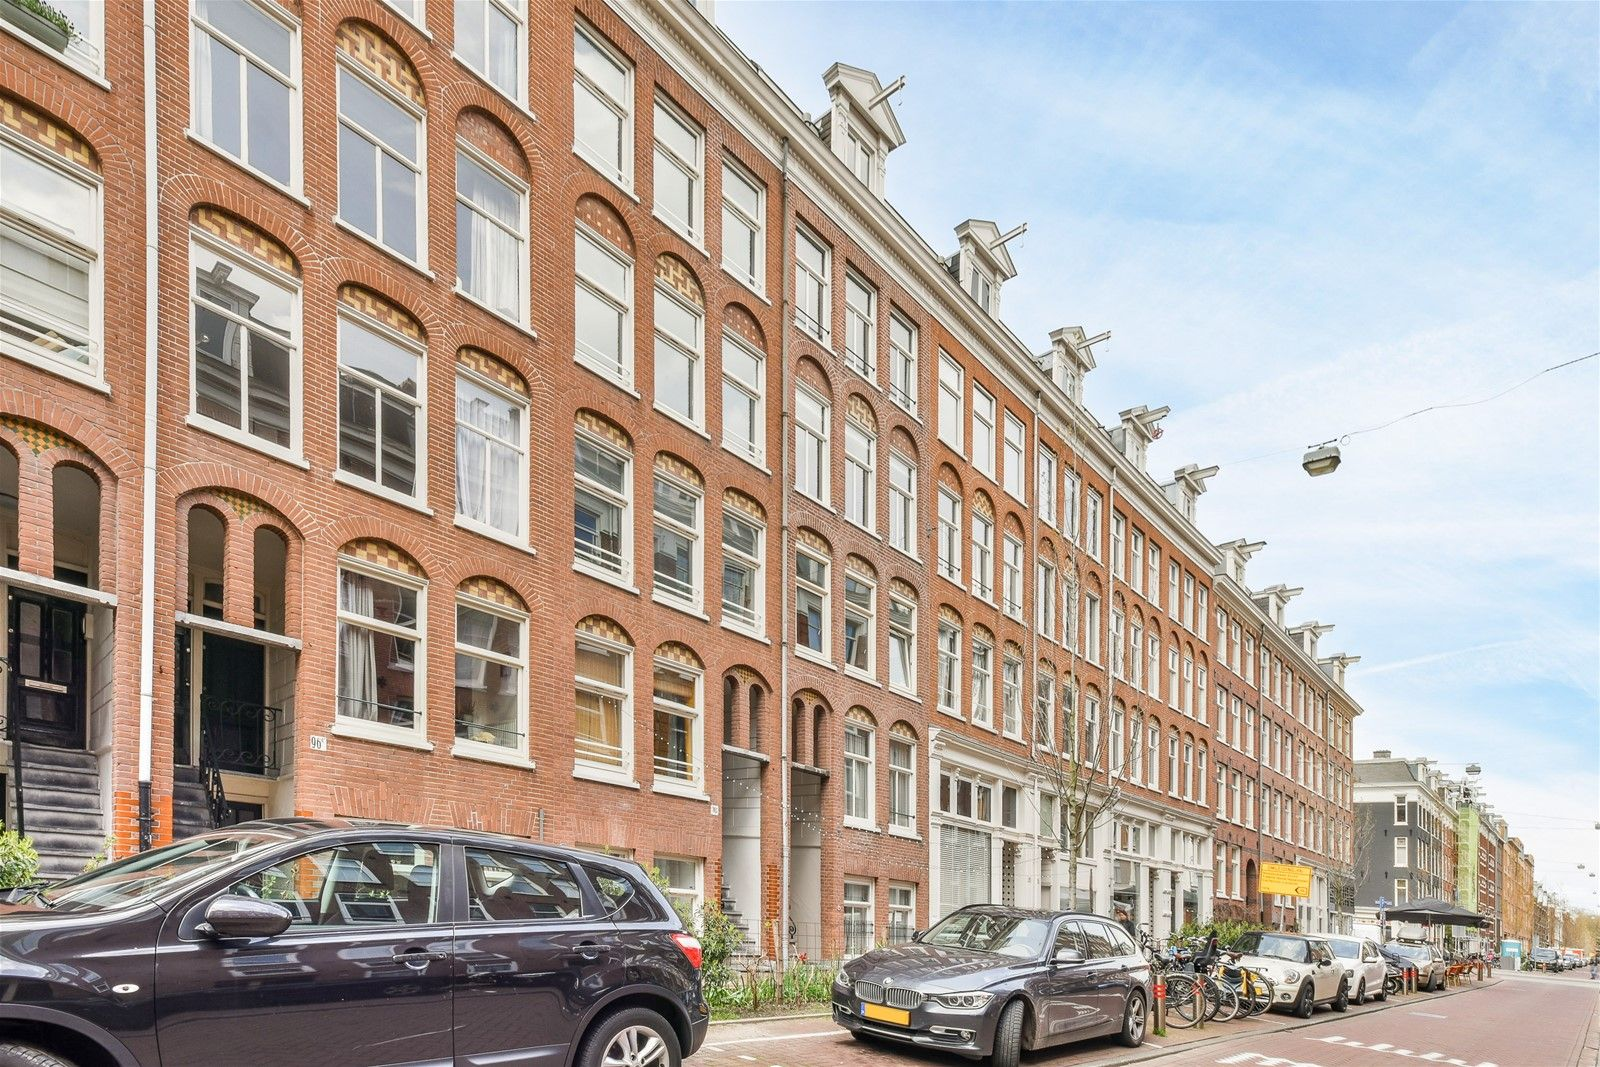 Van Oldenbarneveldtstraat 96A3, Amsterdam